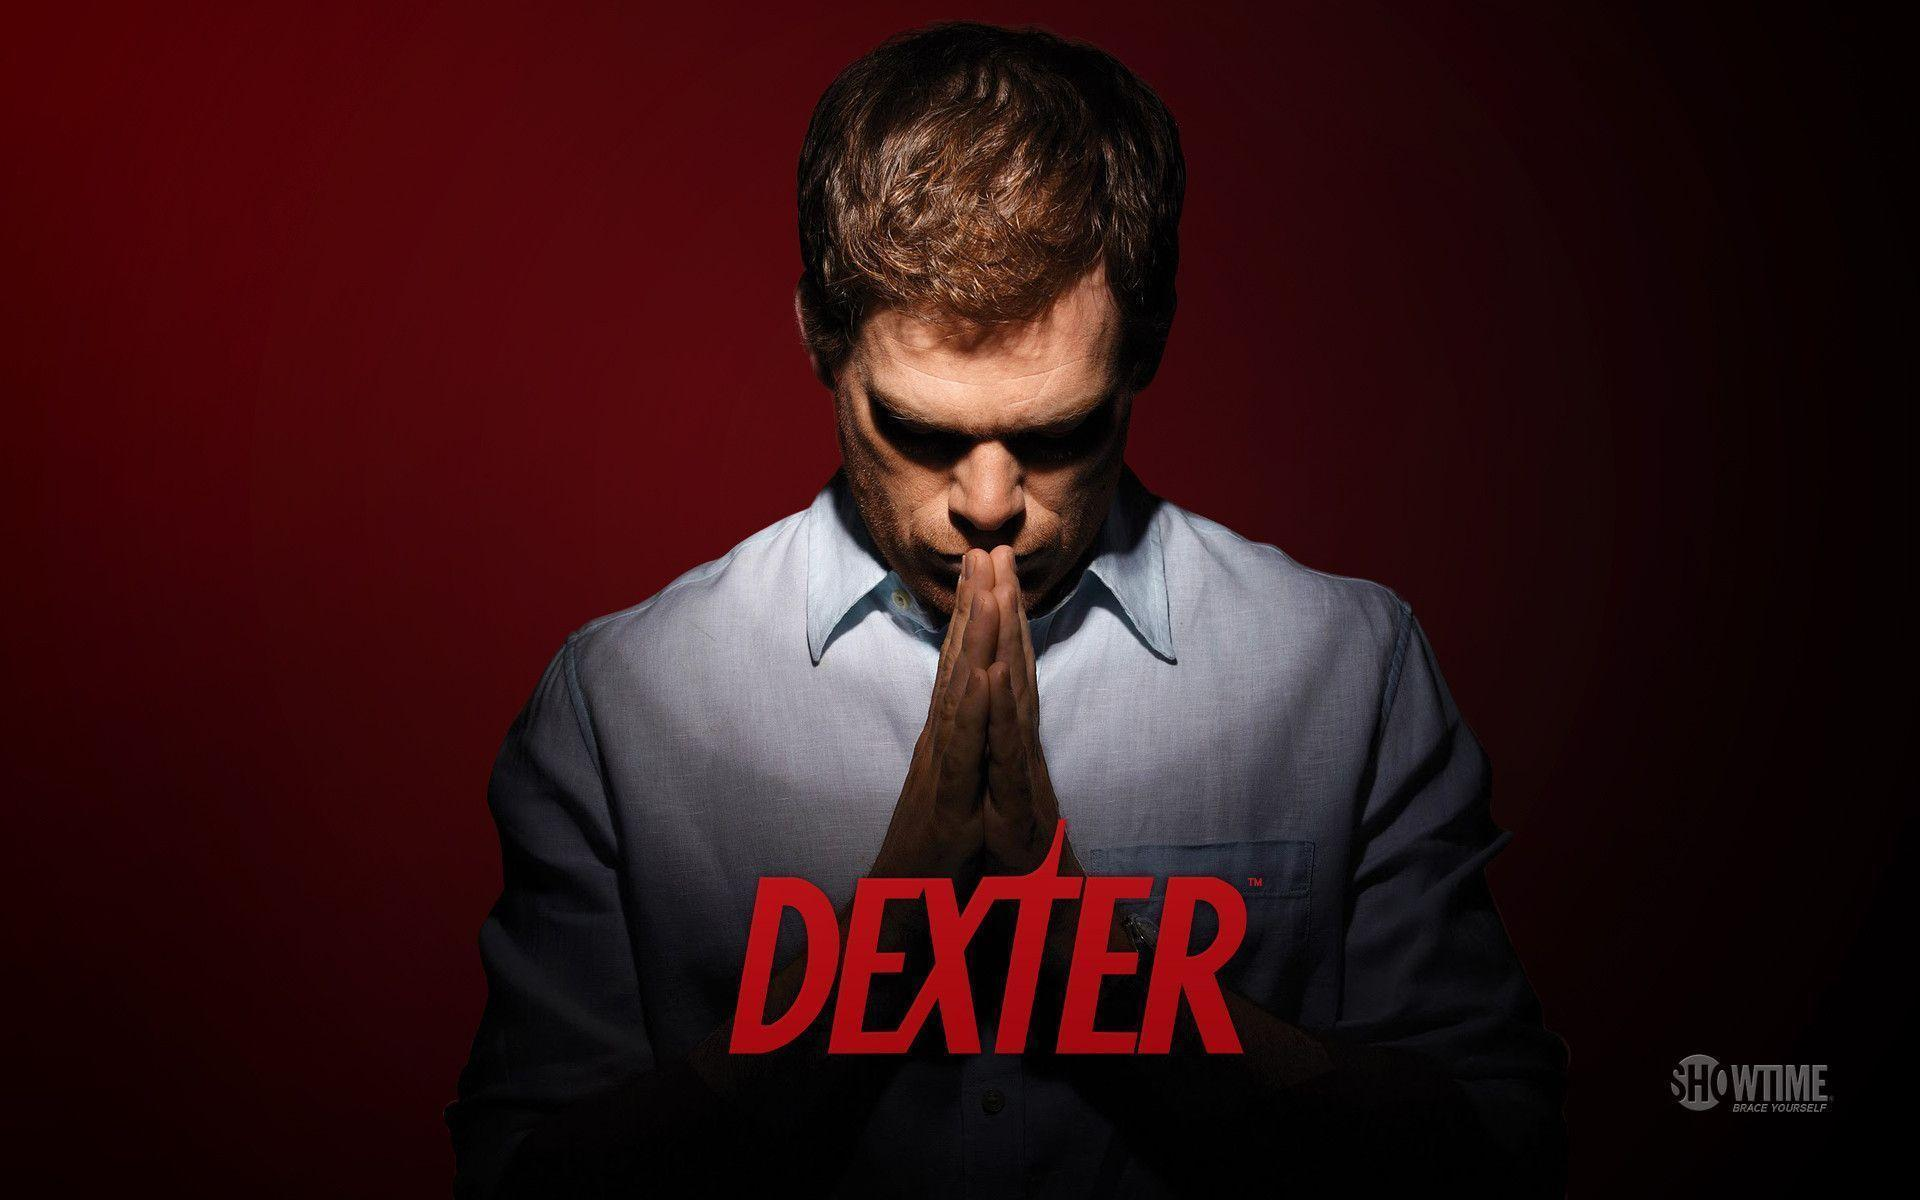 Dexter Hd Wallpapers Wallpaper Cave